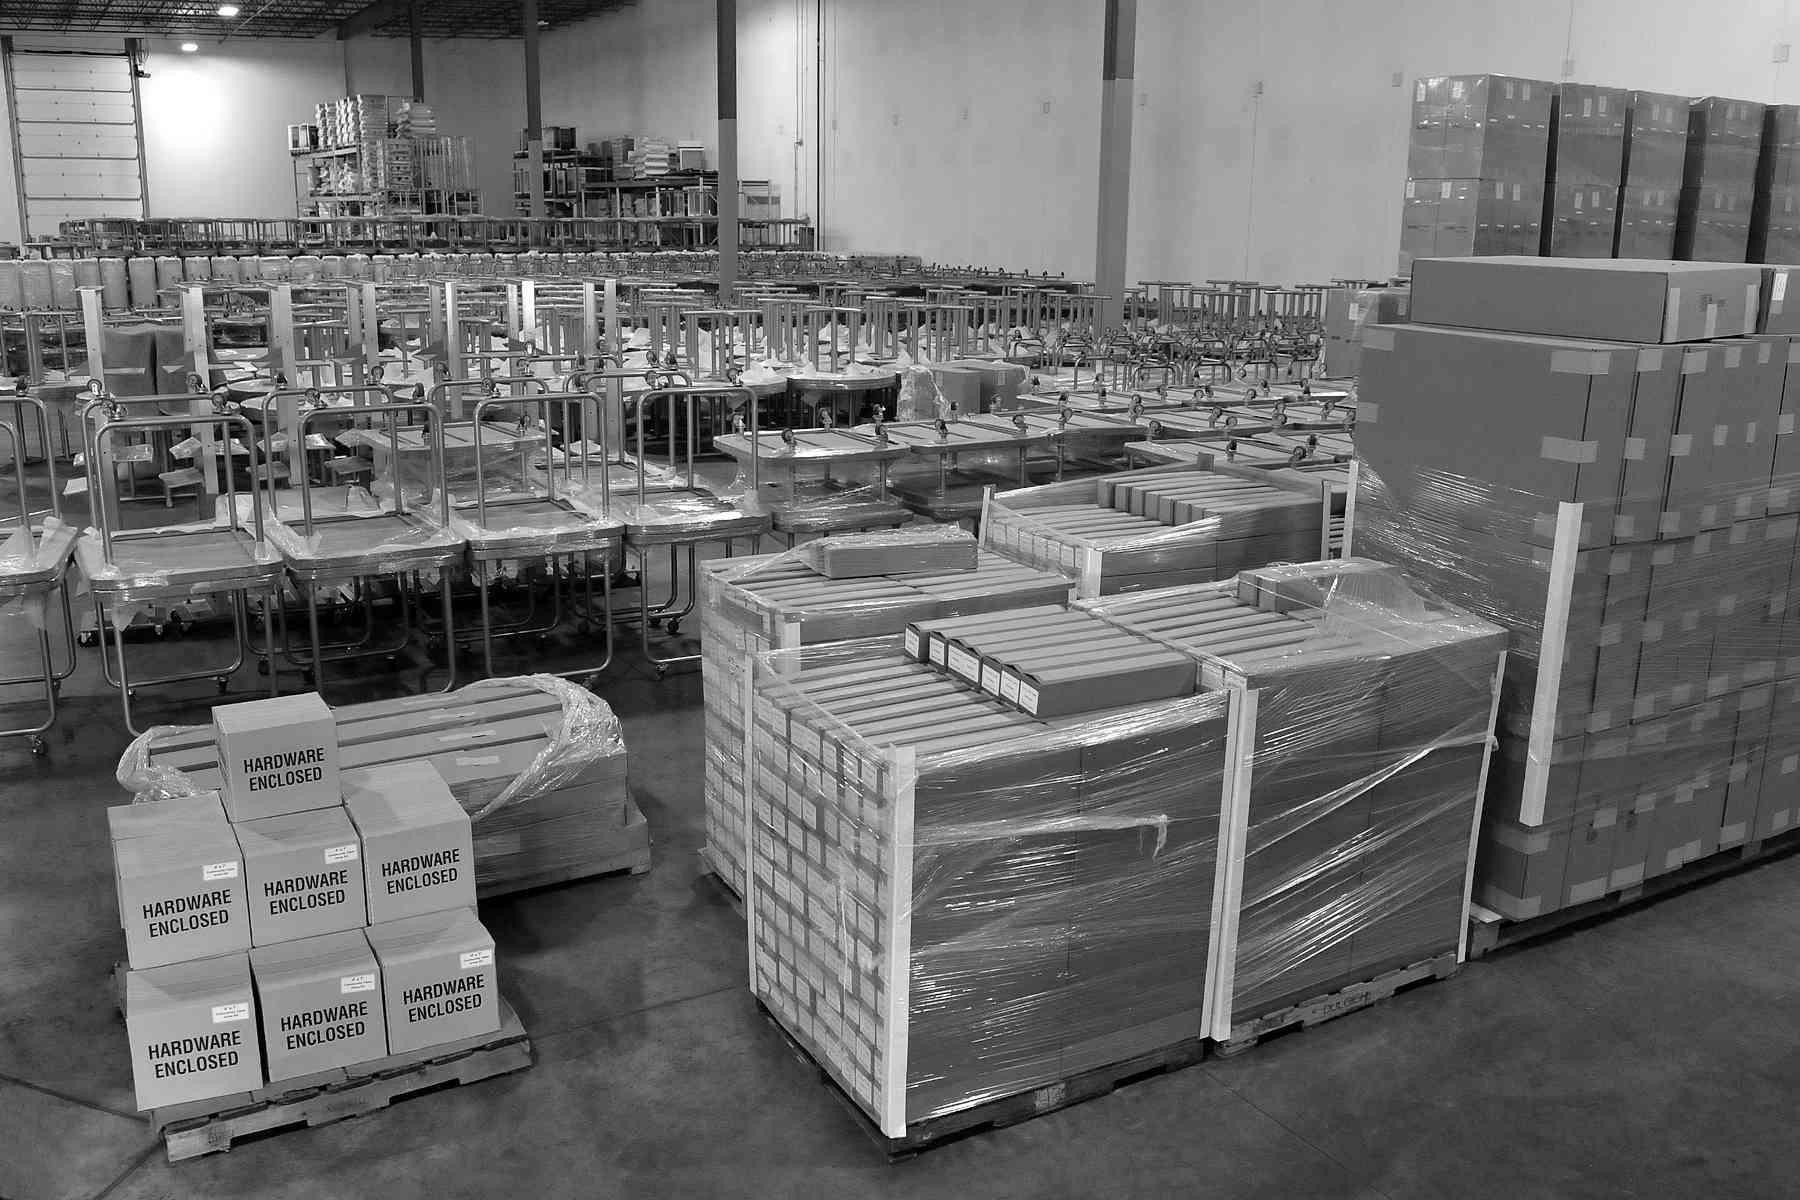 https://mw-sf.com/wp-content/uploads/2019/11/inventory-management-04.jpg